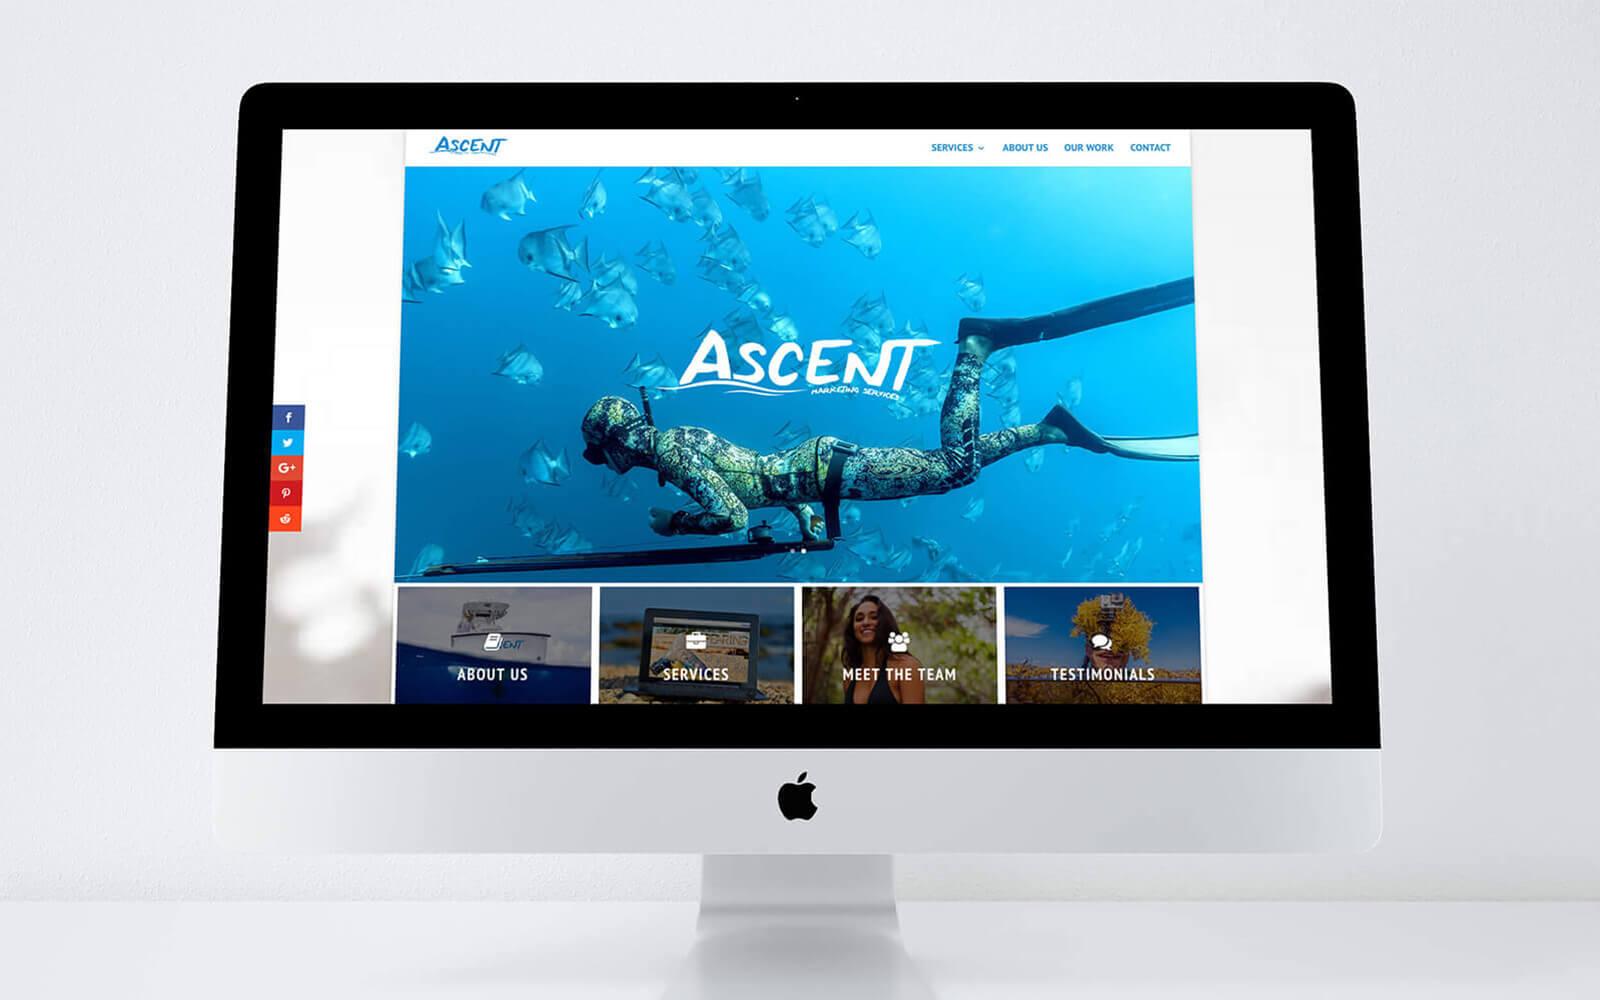 Ascent Marketing Services mockup